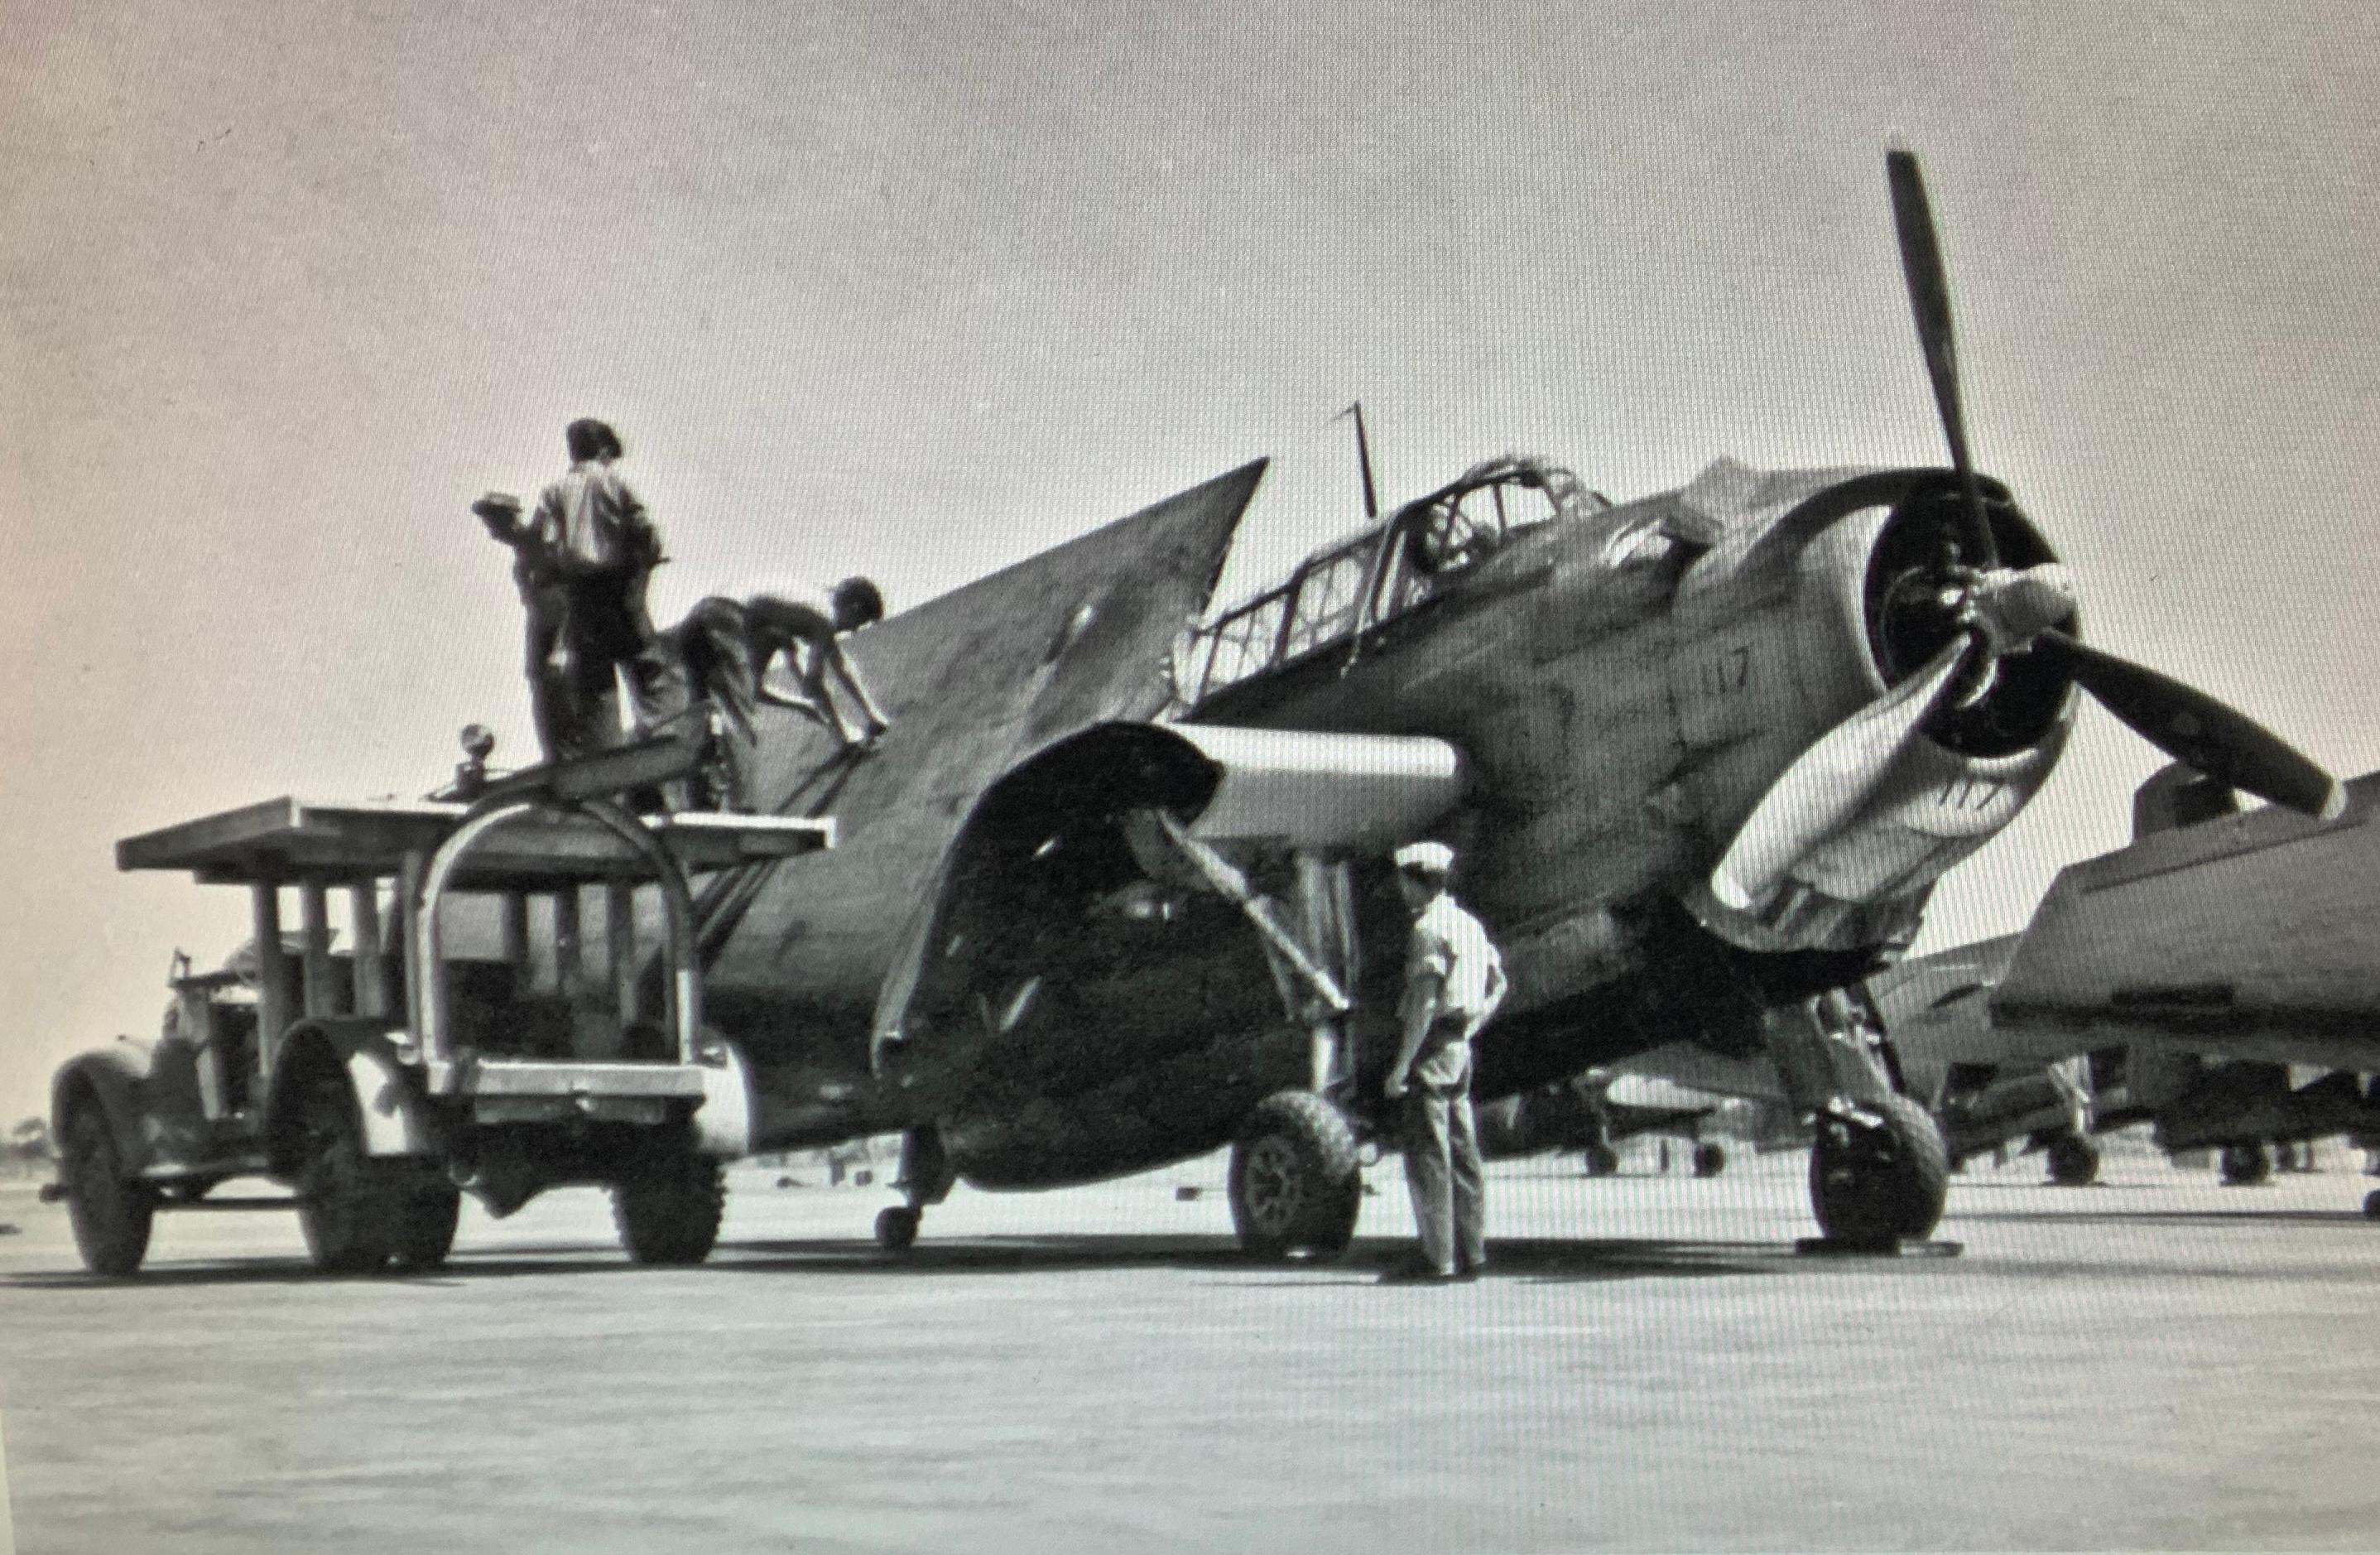 FT-117